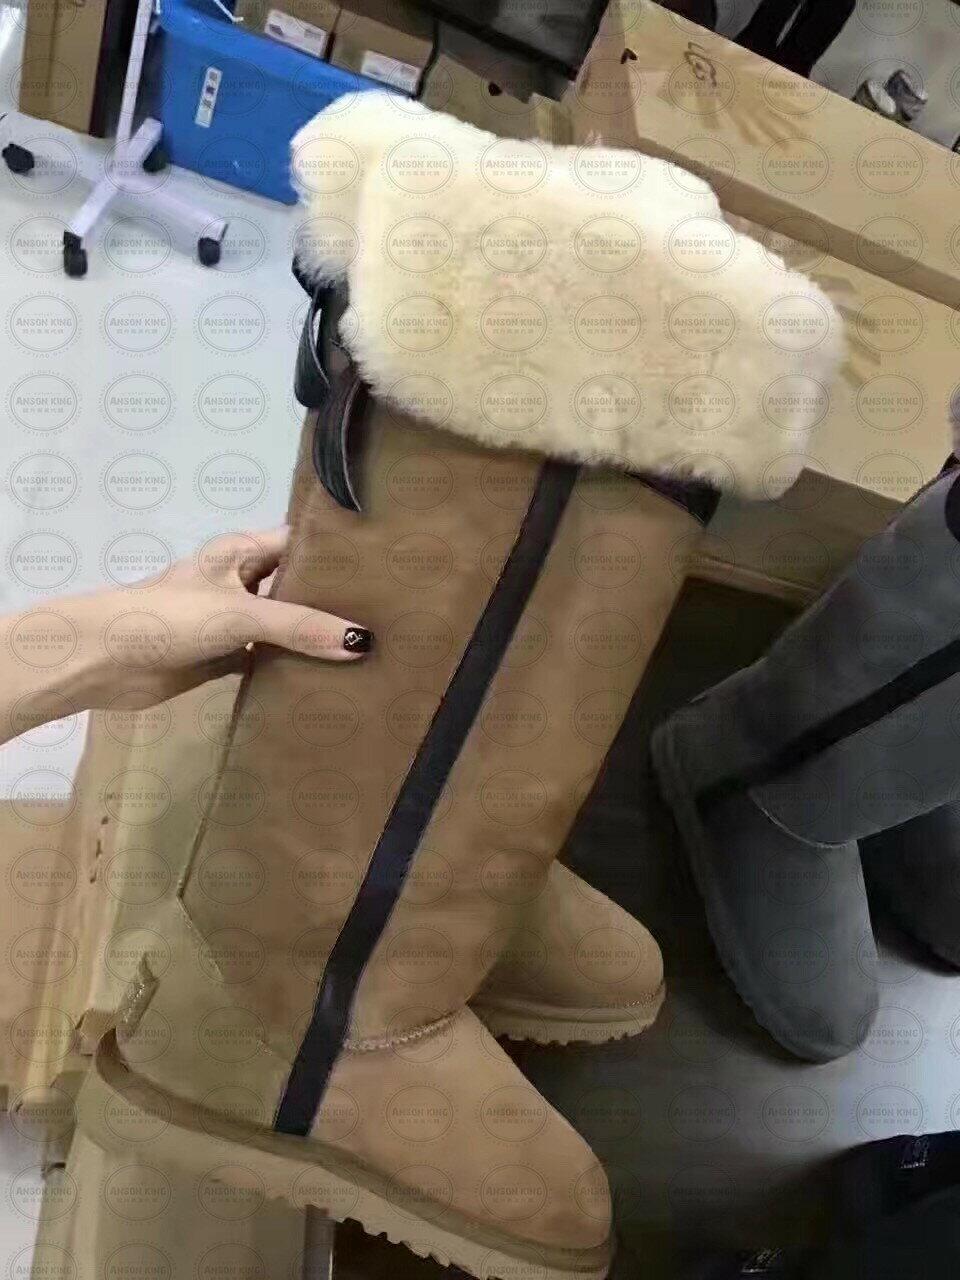 OUTLET正品代購 澳洲 UGG 千頌伊同款過膝羊皮毛雪靴 保暖 真皮羊皮毛 雪靴 短靴 駝色 0